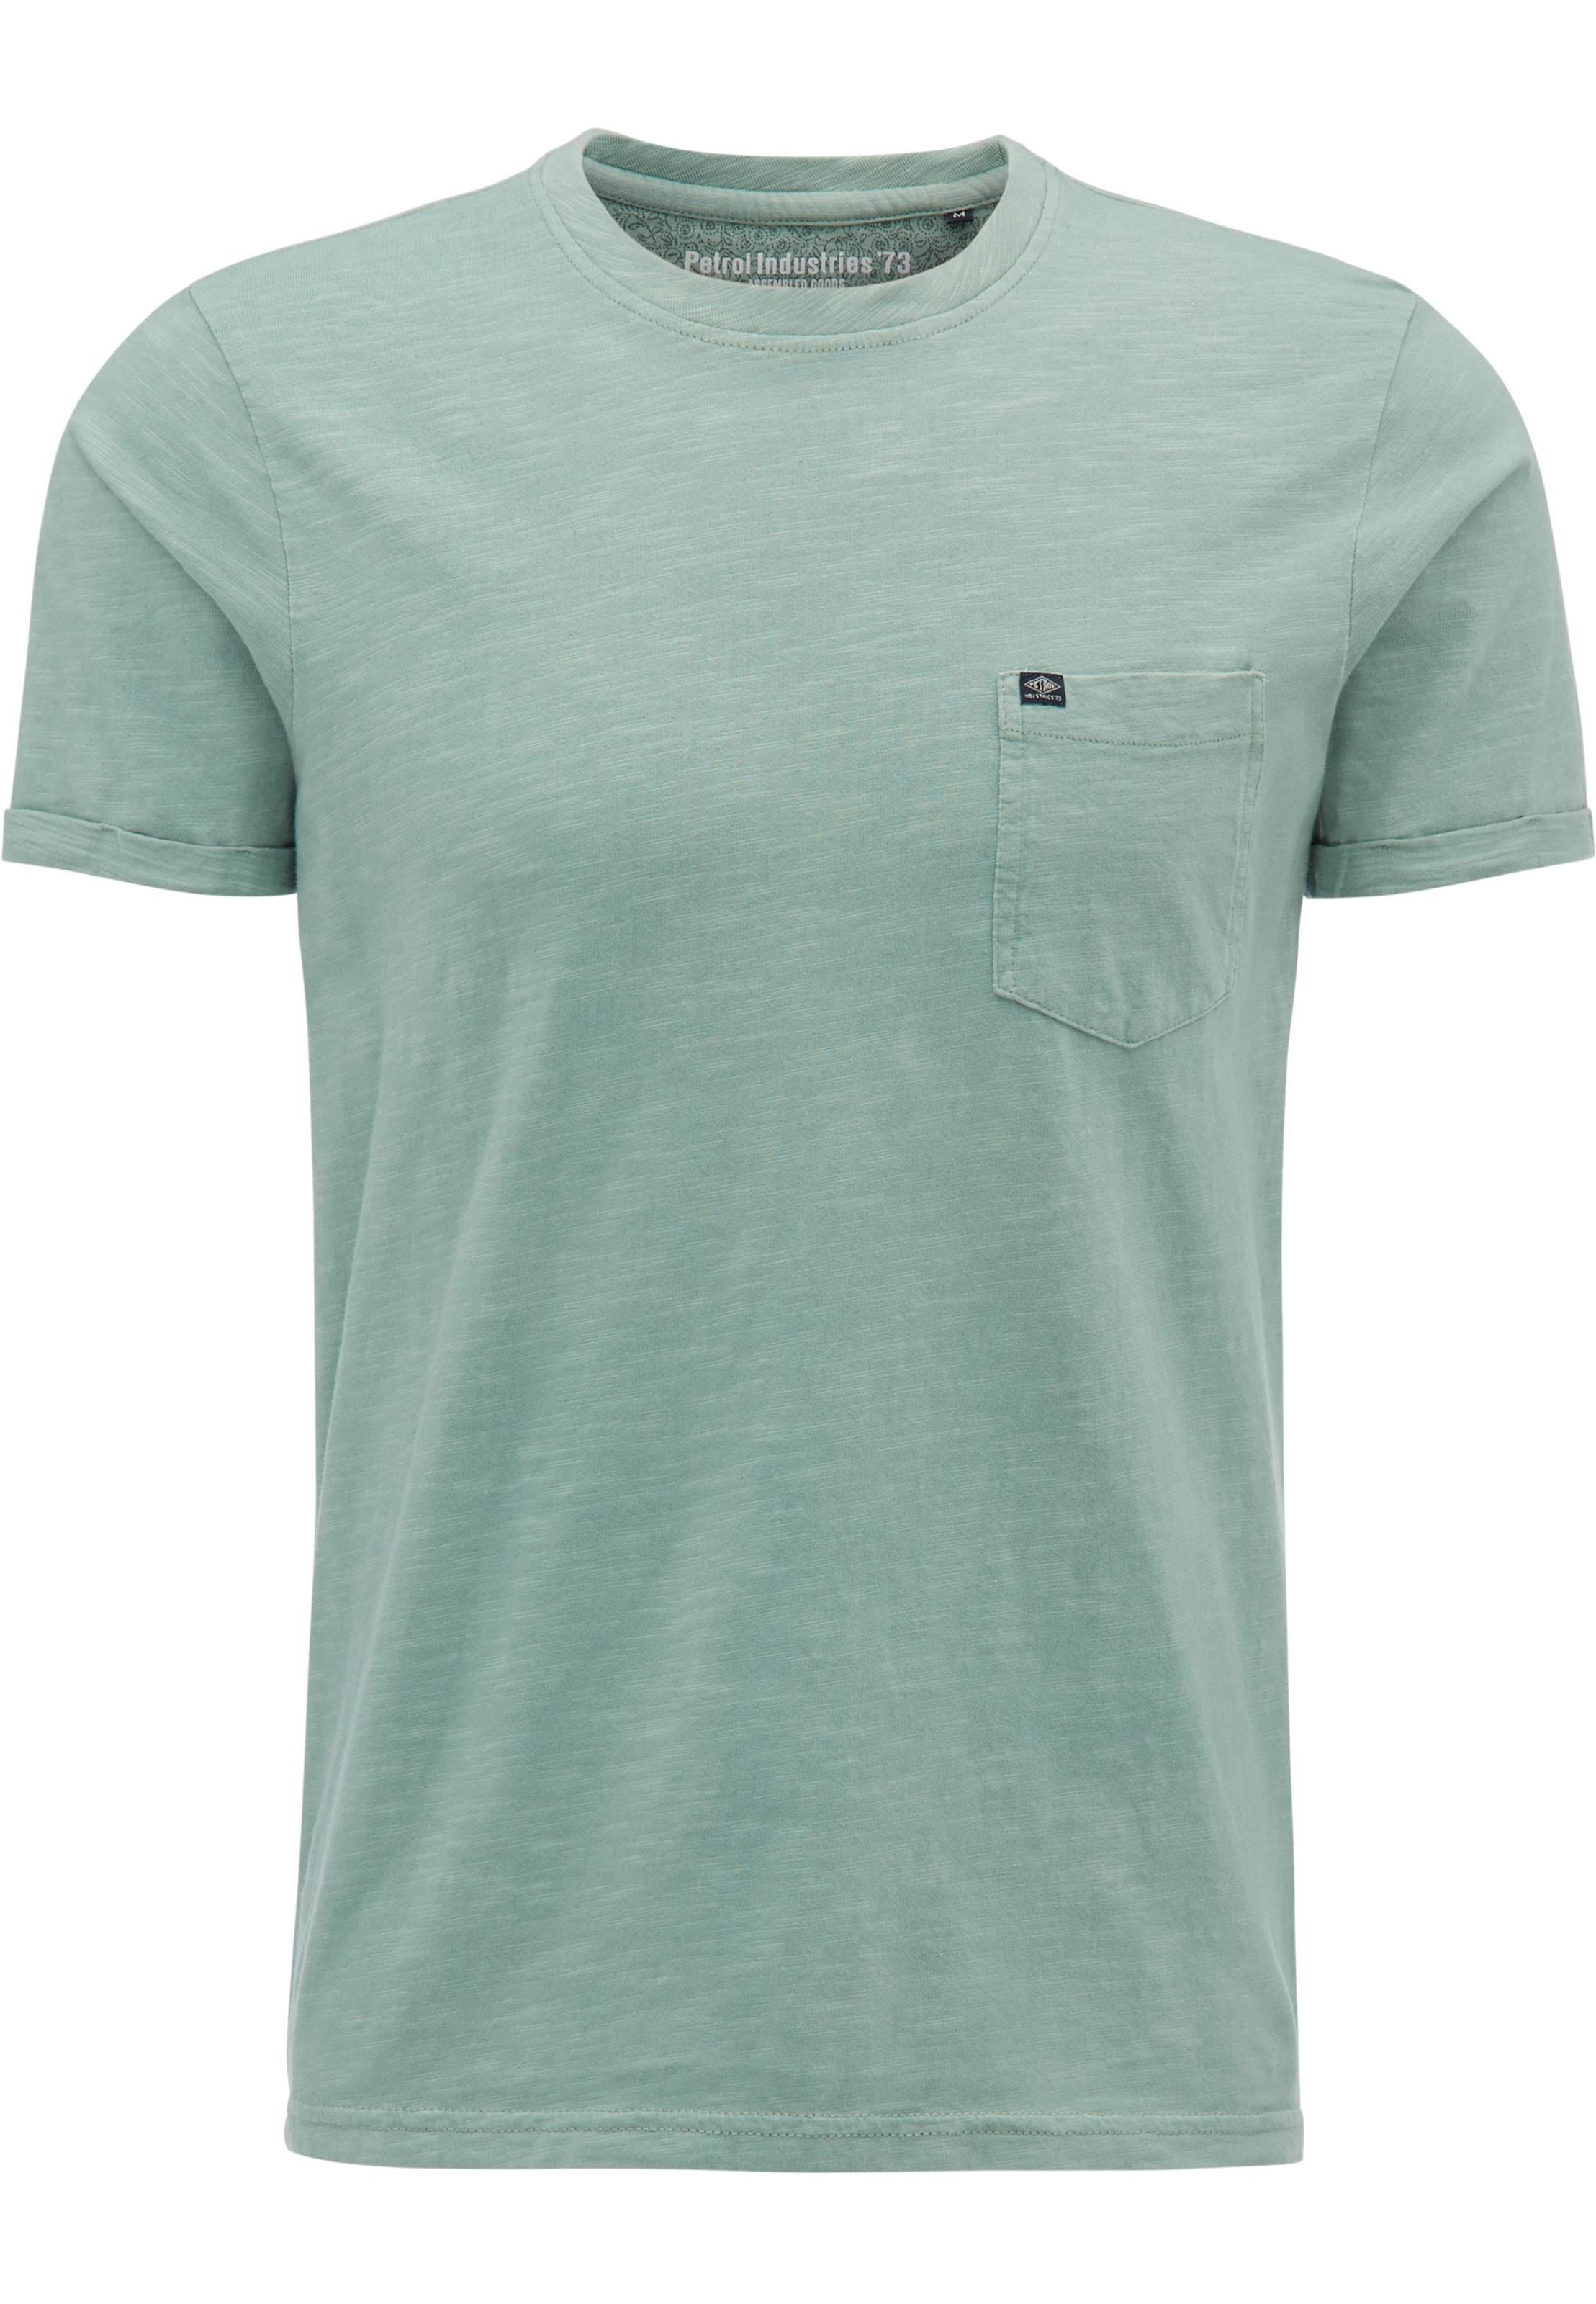 T Bleu Fumé En shirt Petrol Industries DHIE9YW2